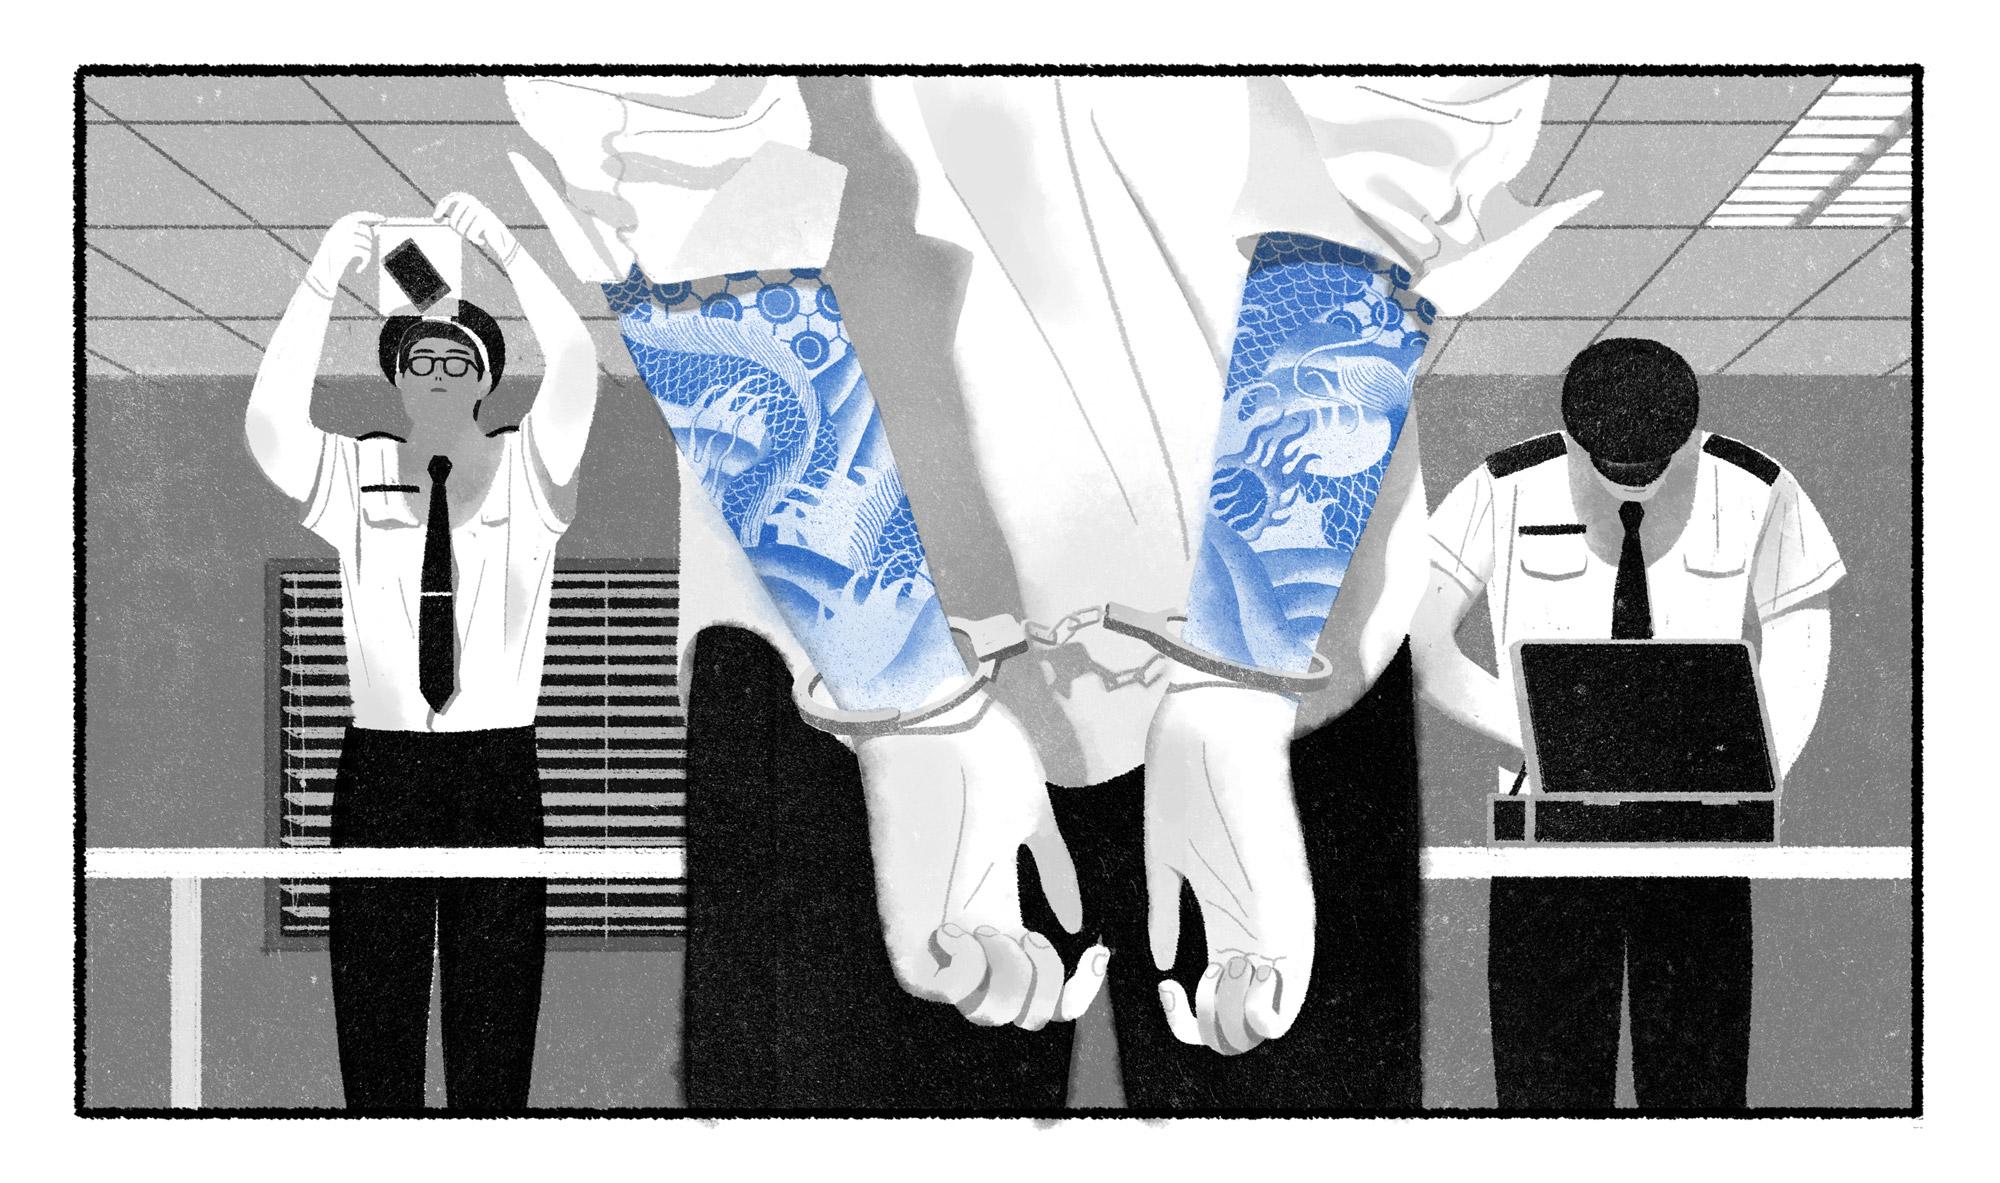 A true crime tale of comic books, corruption, and a $9 million